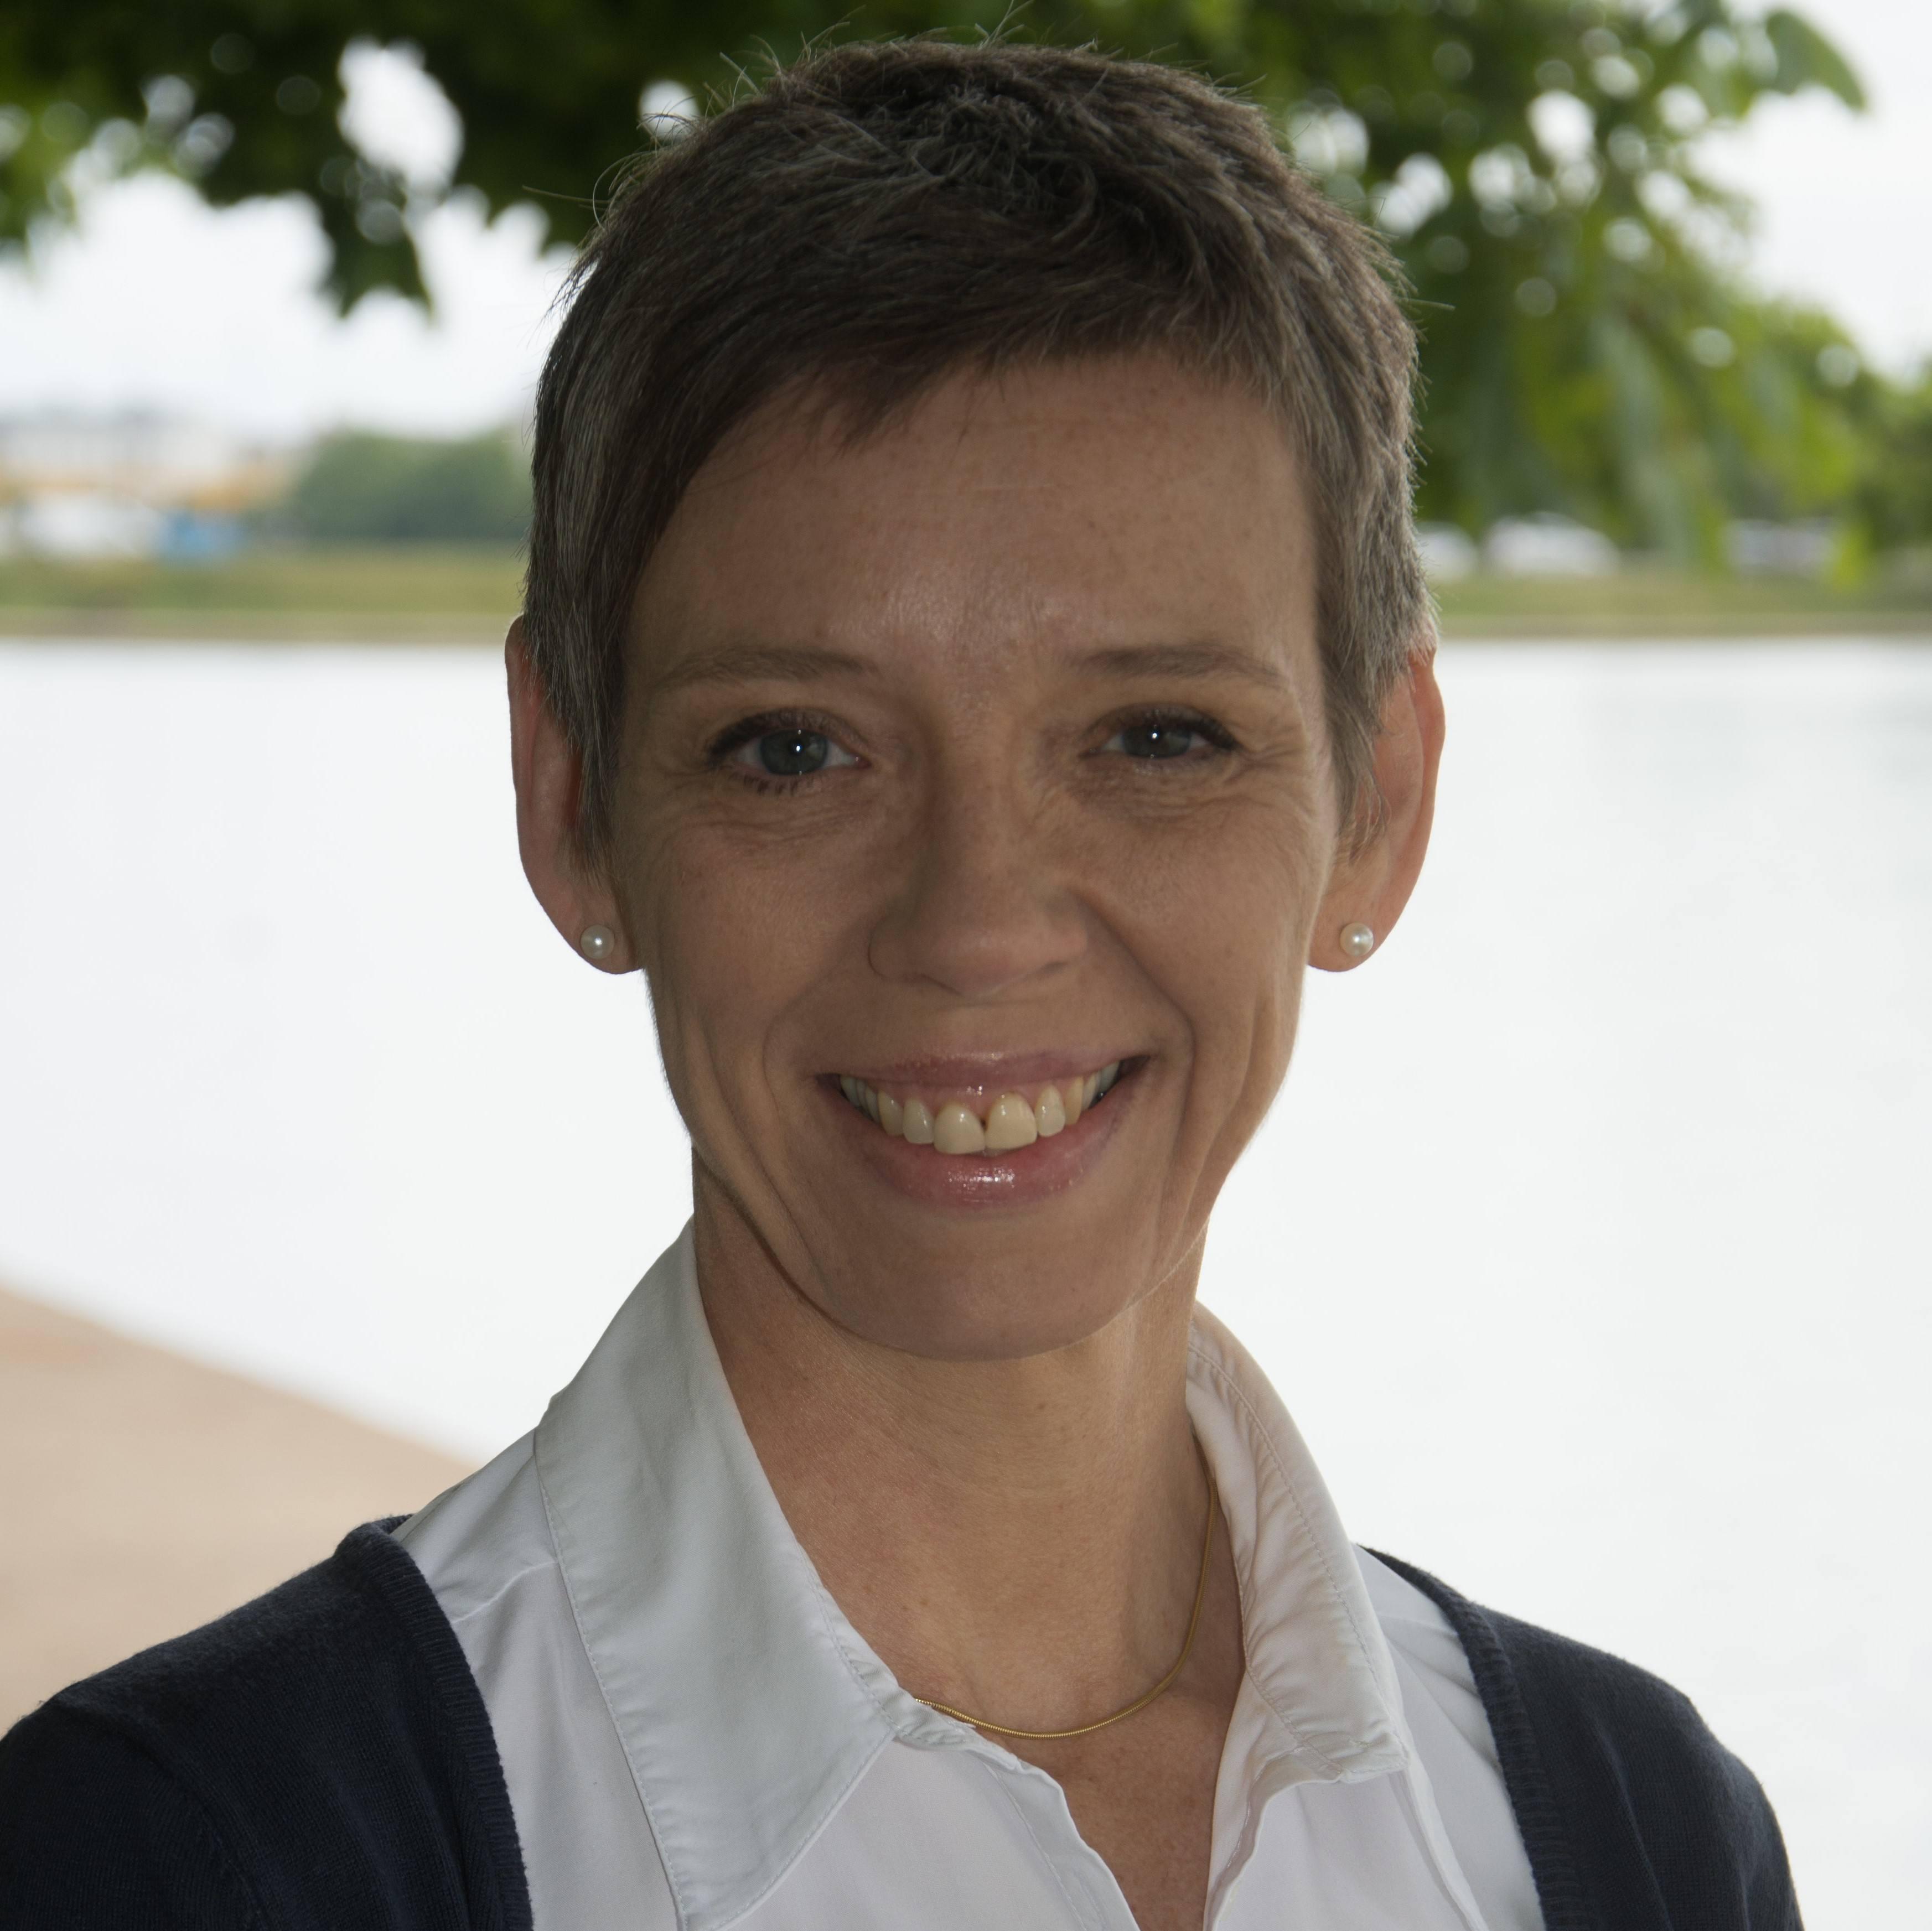 Annette Voigt